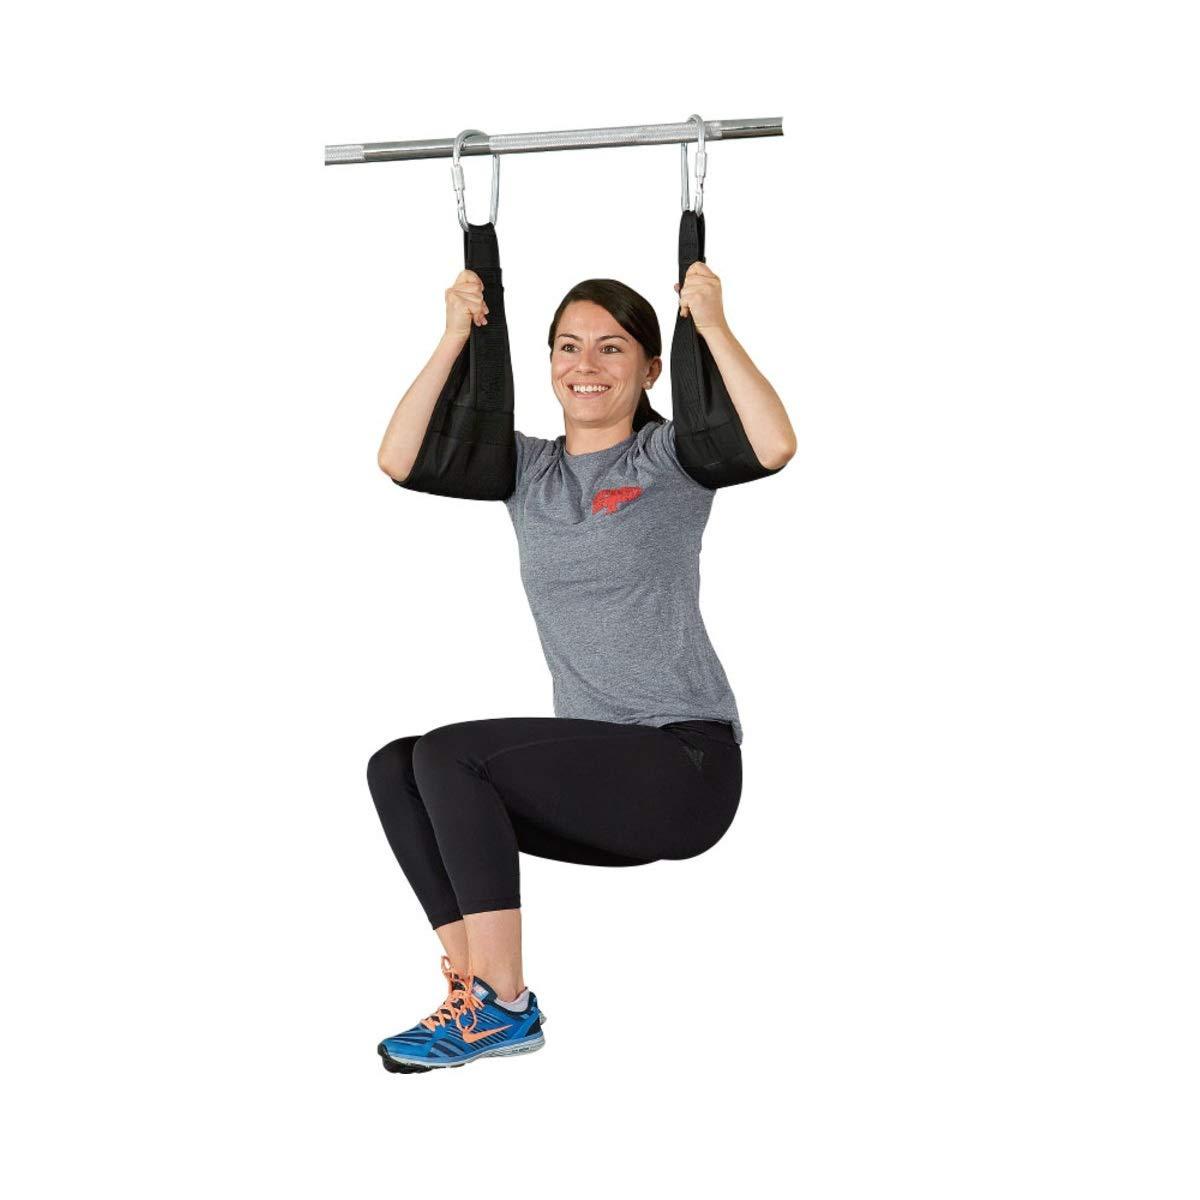 Flytool Ab Straps Core Exercise Equipment Training Gym Abdominal Hanging Straps, Black by Flytool (Image #8)